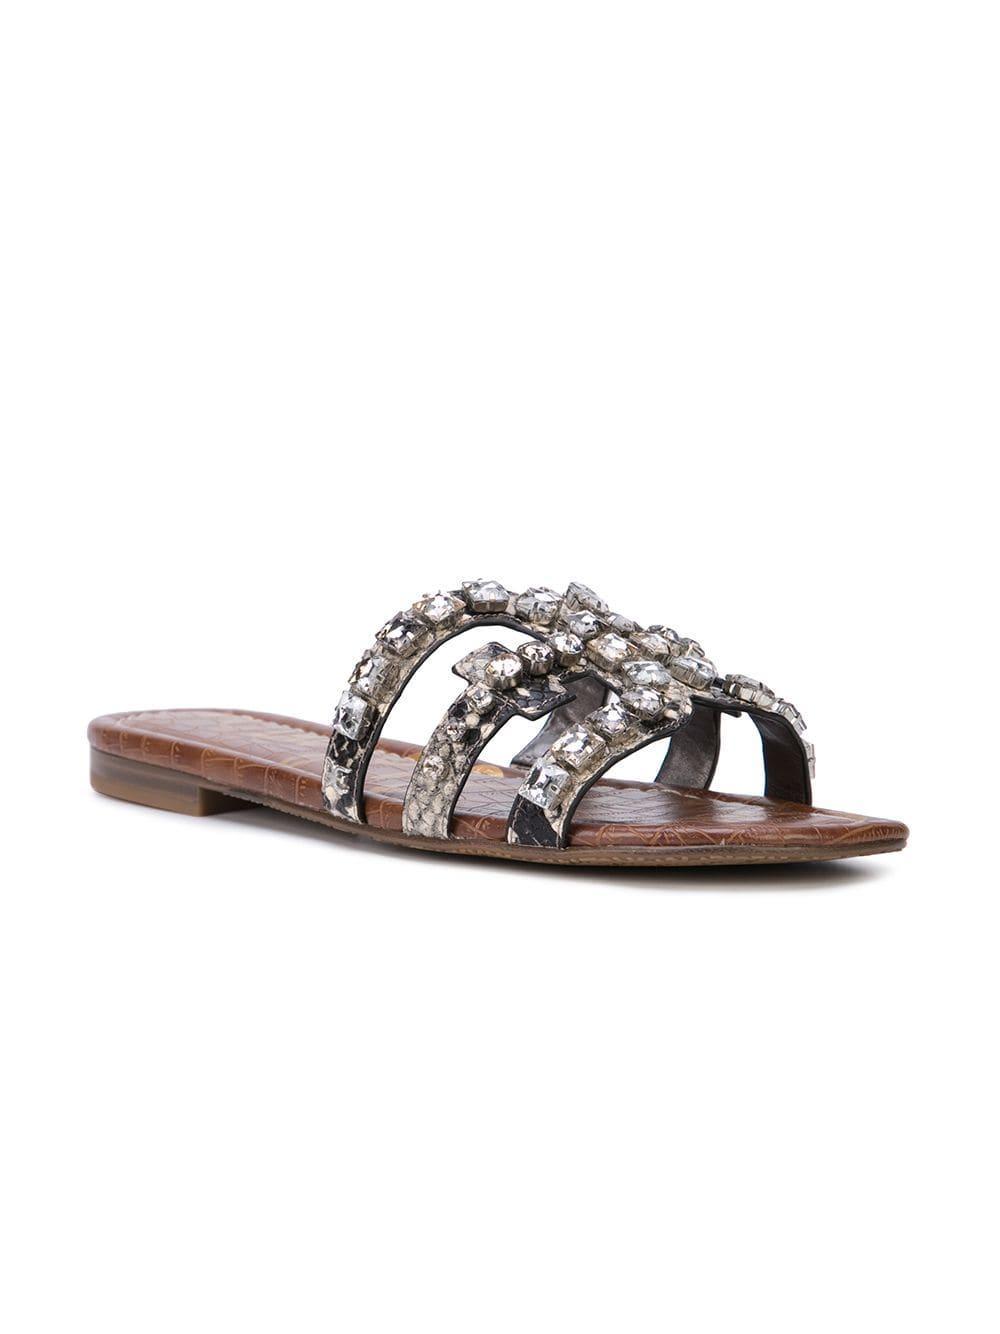 88120639a Sam Edelman Putty Crystal Embellished Sandals in Metallic - Lyst